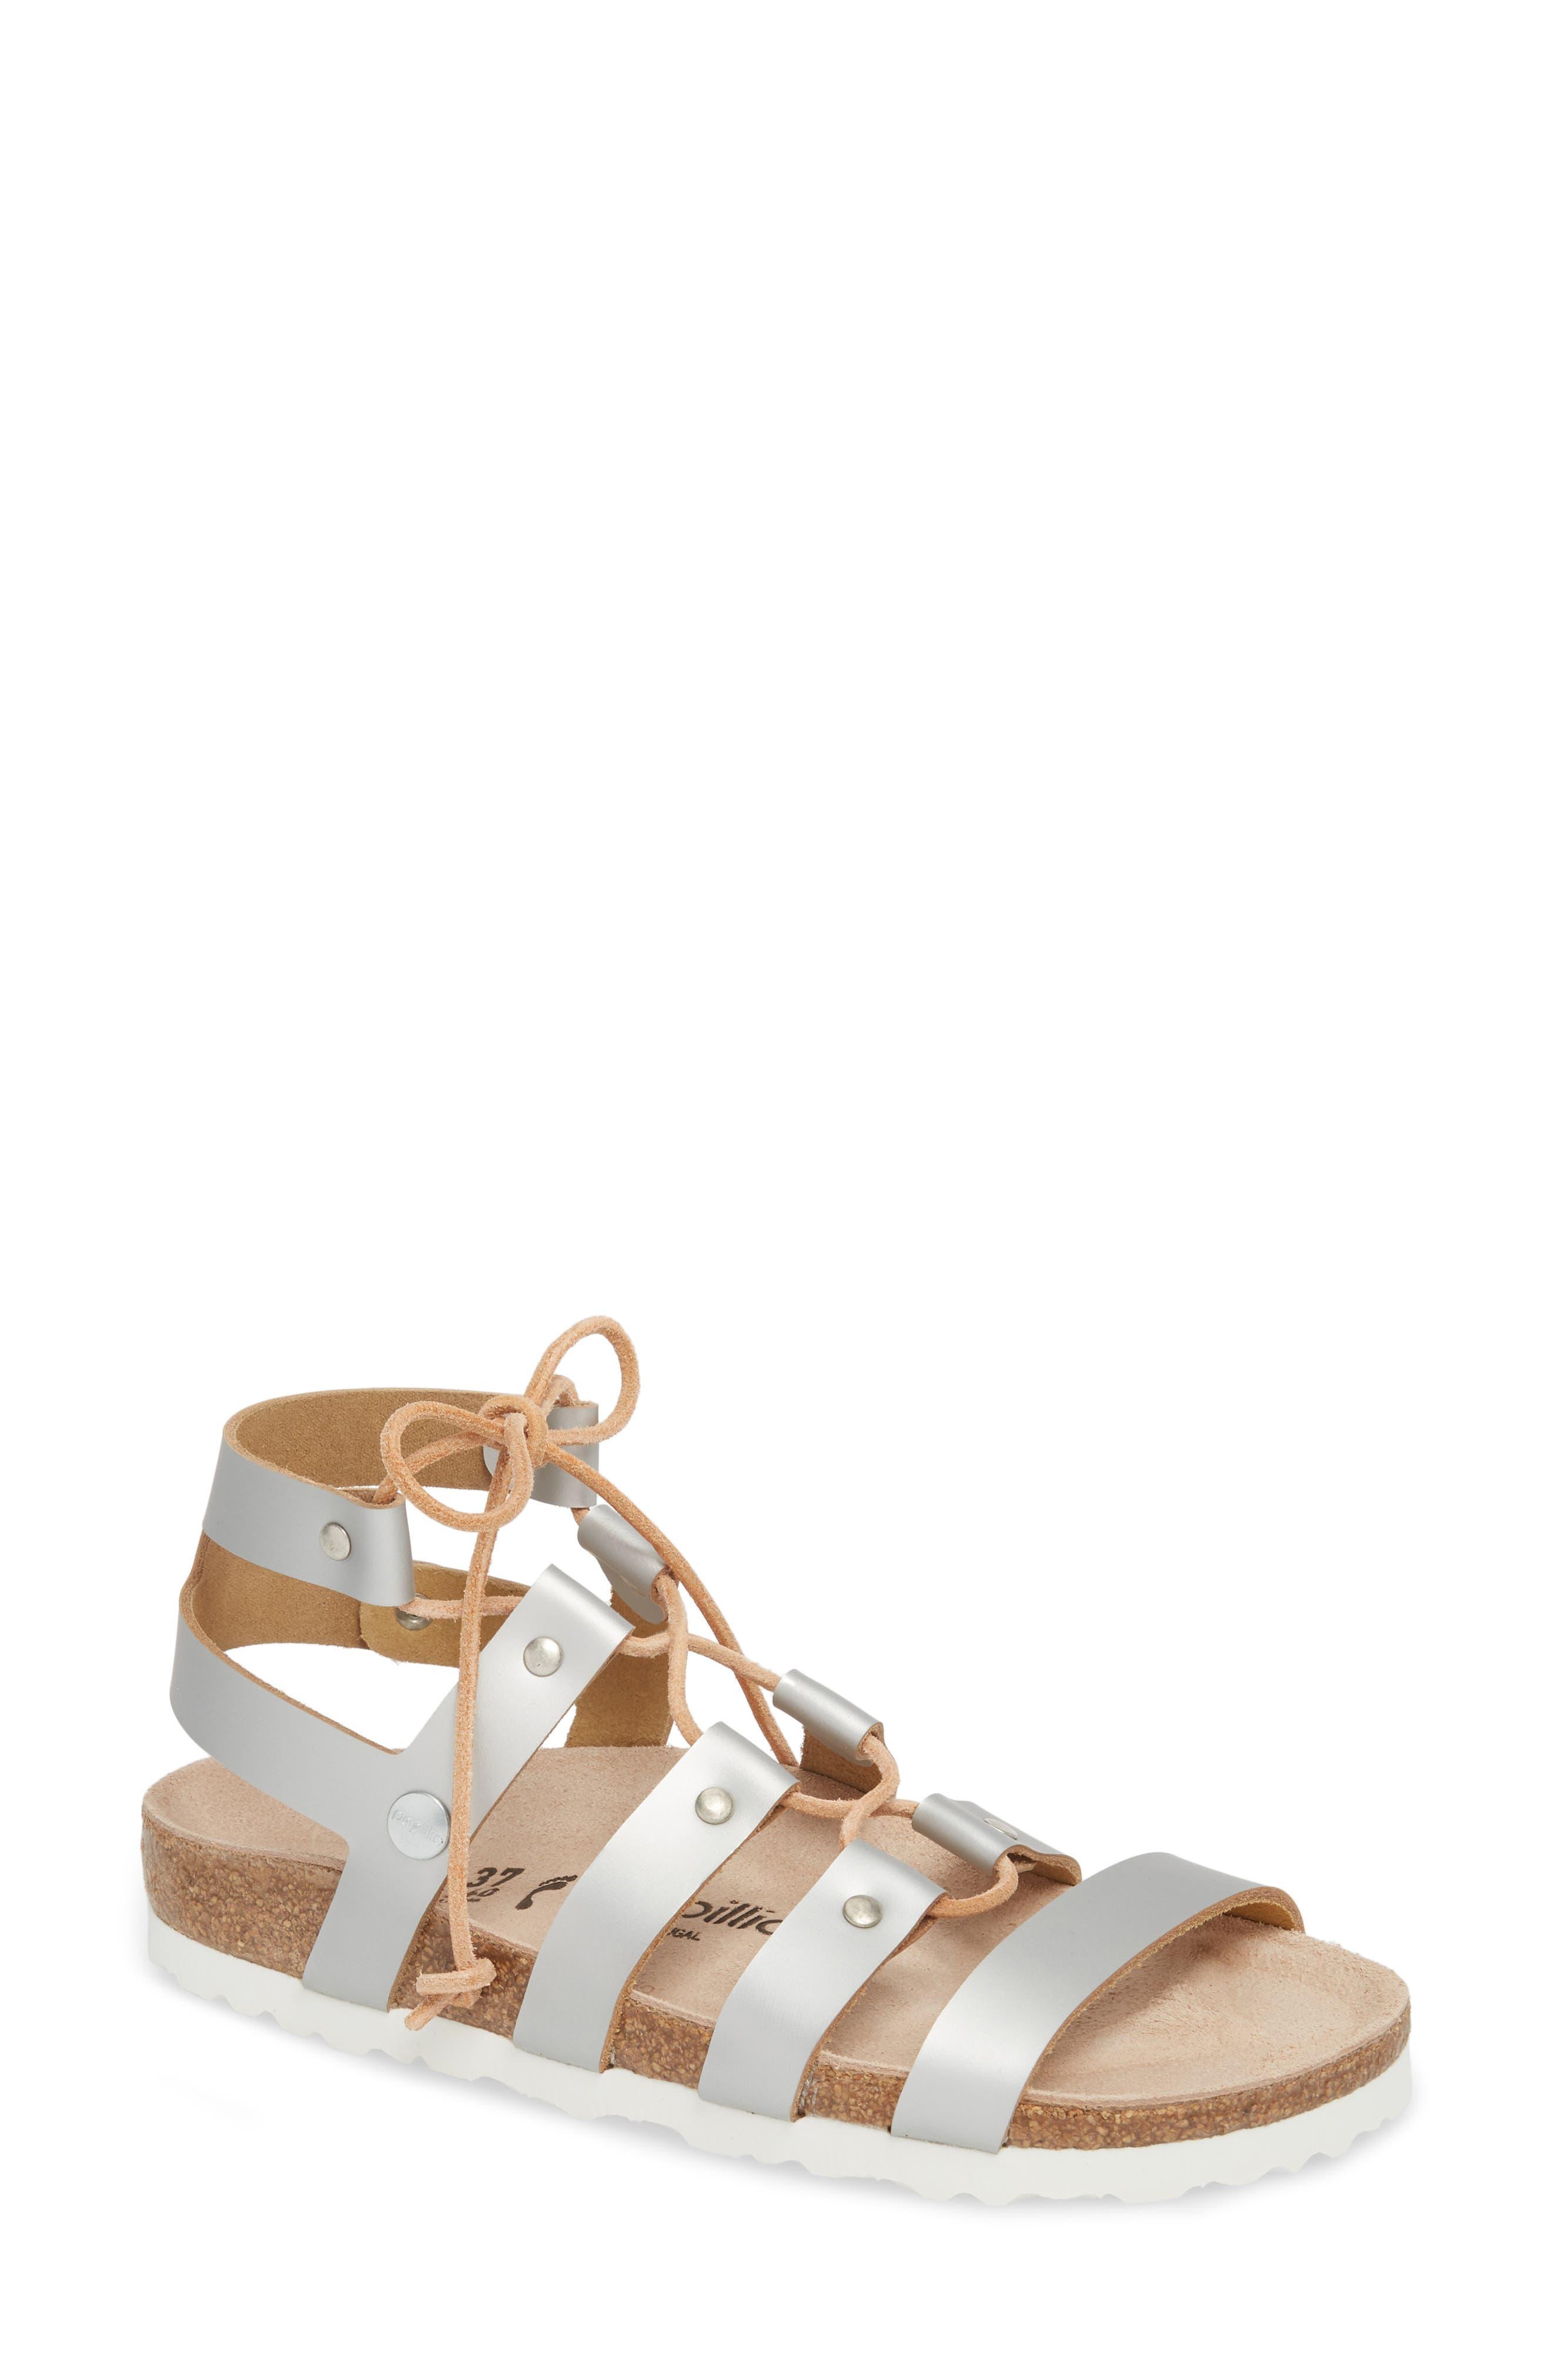 Papillio by Birkenstock Cleo Gladiator Sandal (Women)